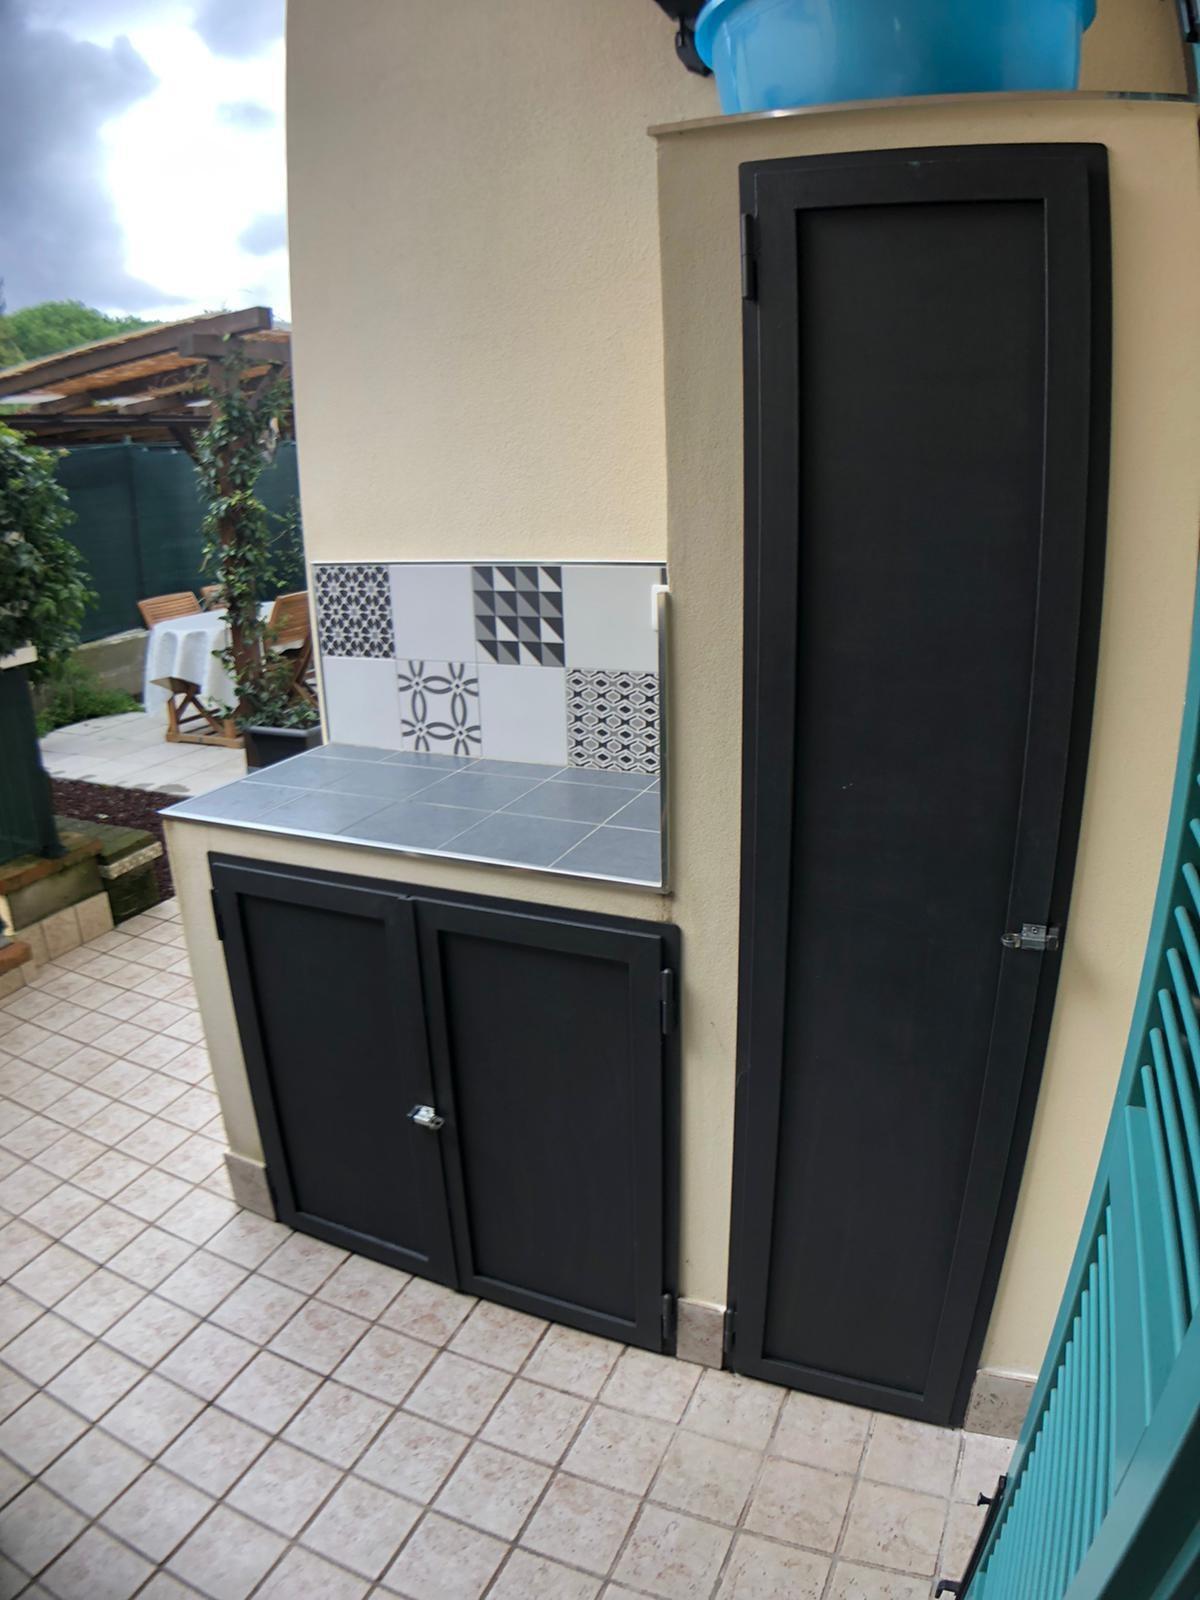 Appartamento in vendita, rif. LI-133